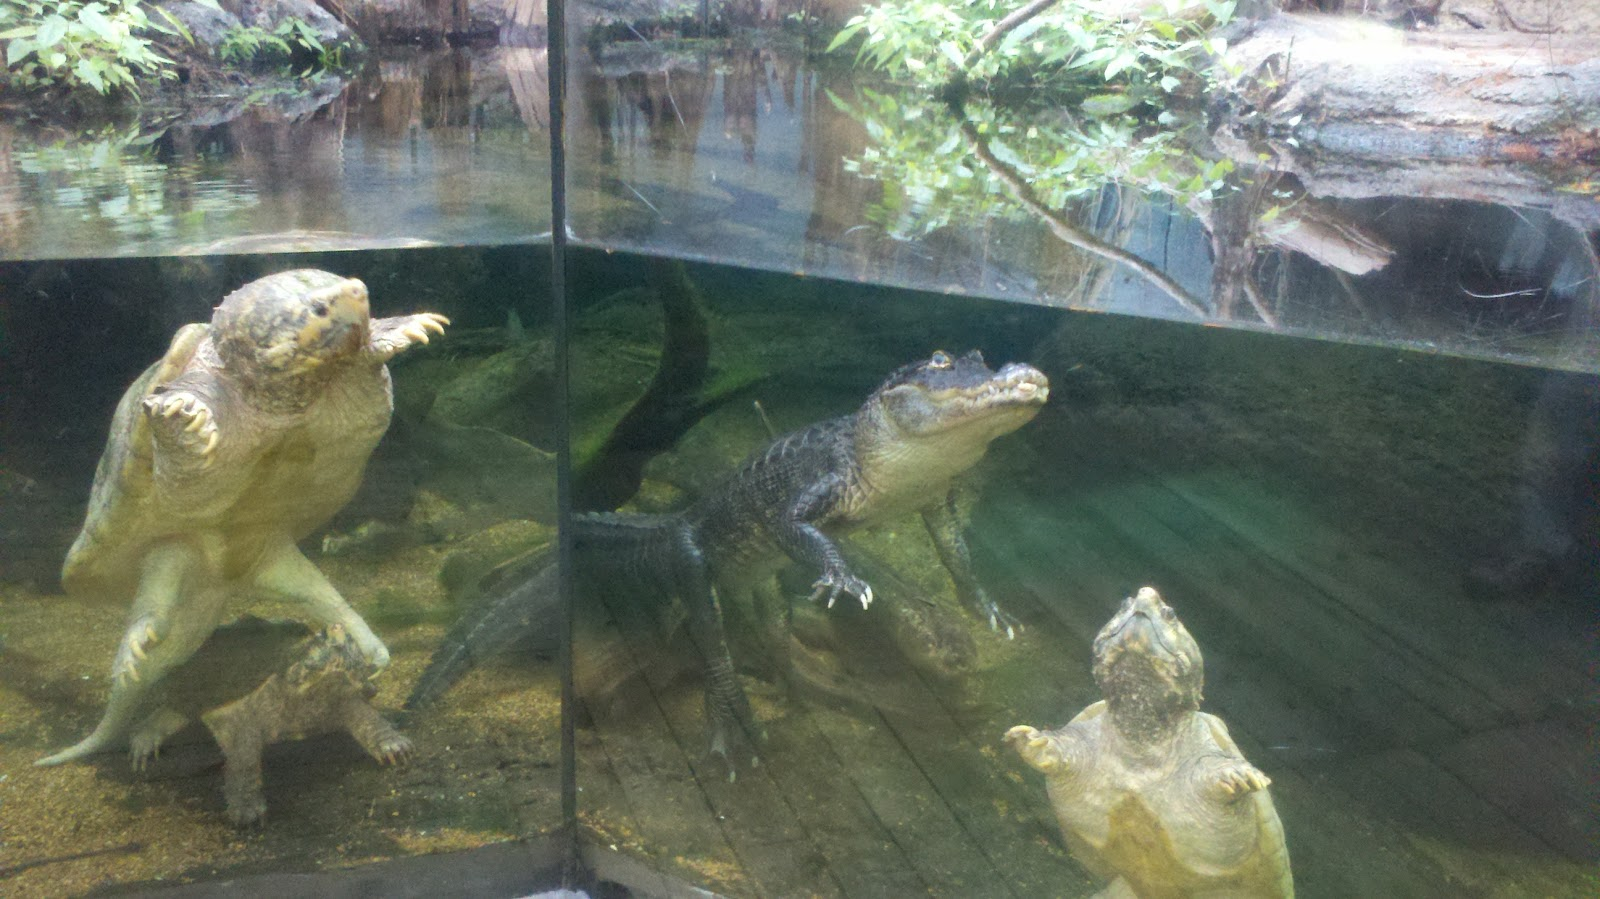 Large Turtle Aquarium : Tennessee Aquarium Blog: Really Big Reptiles Looking Like Best Friends